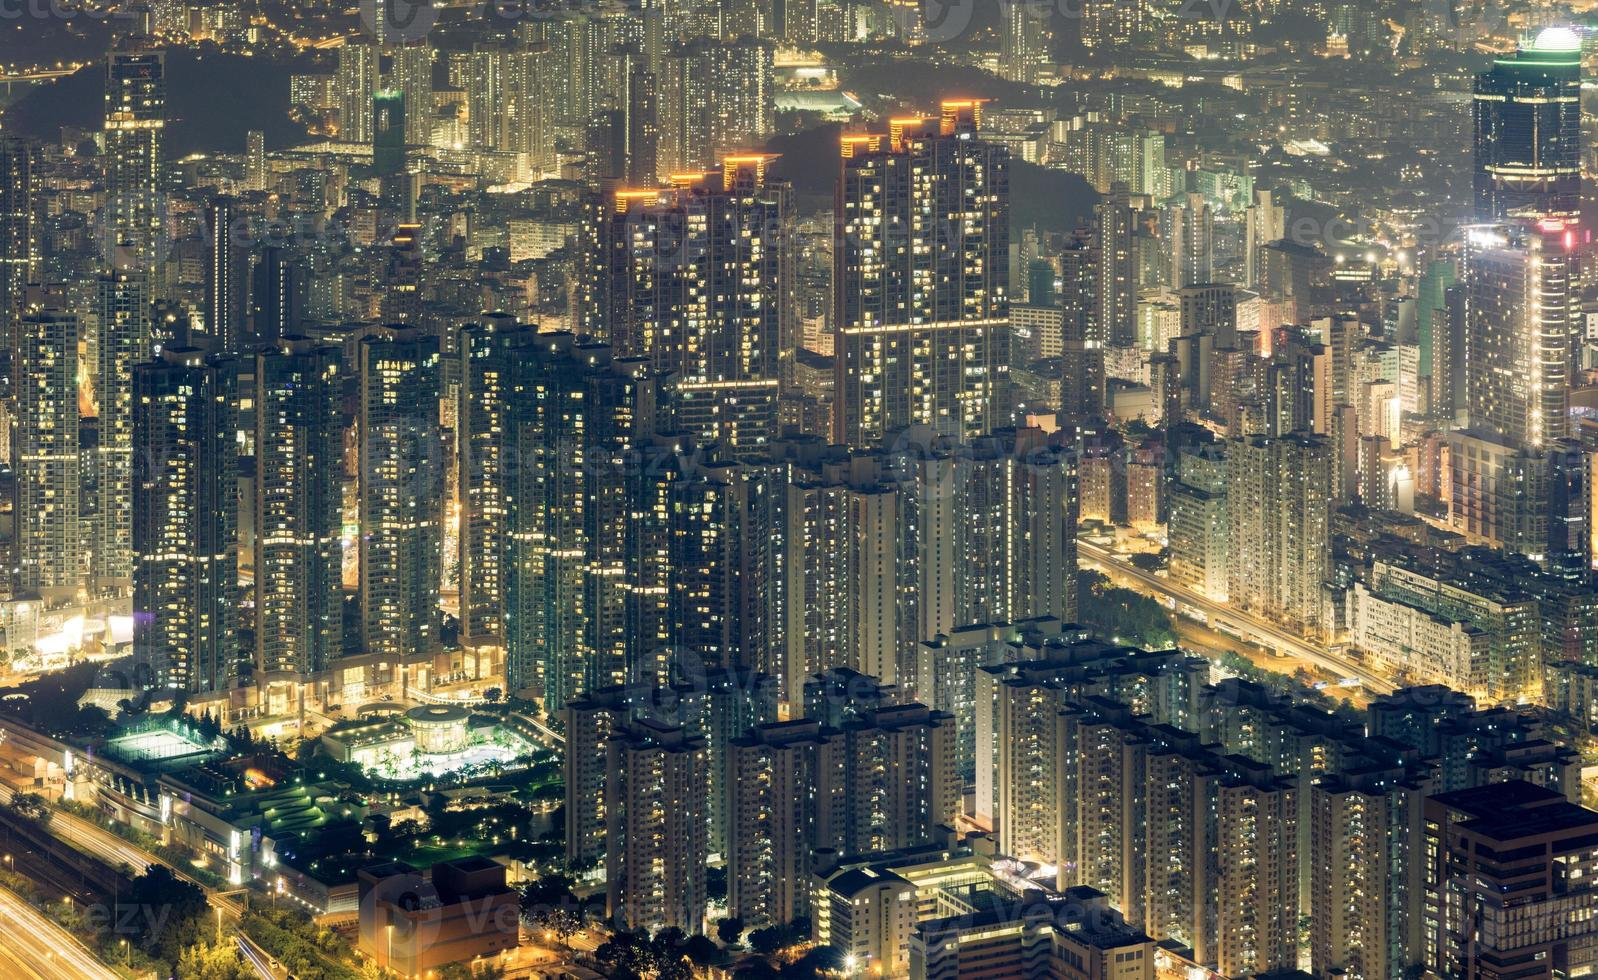 zone de résidence de Hong Kong photo